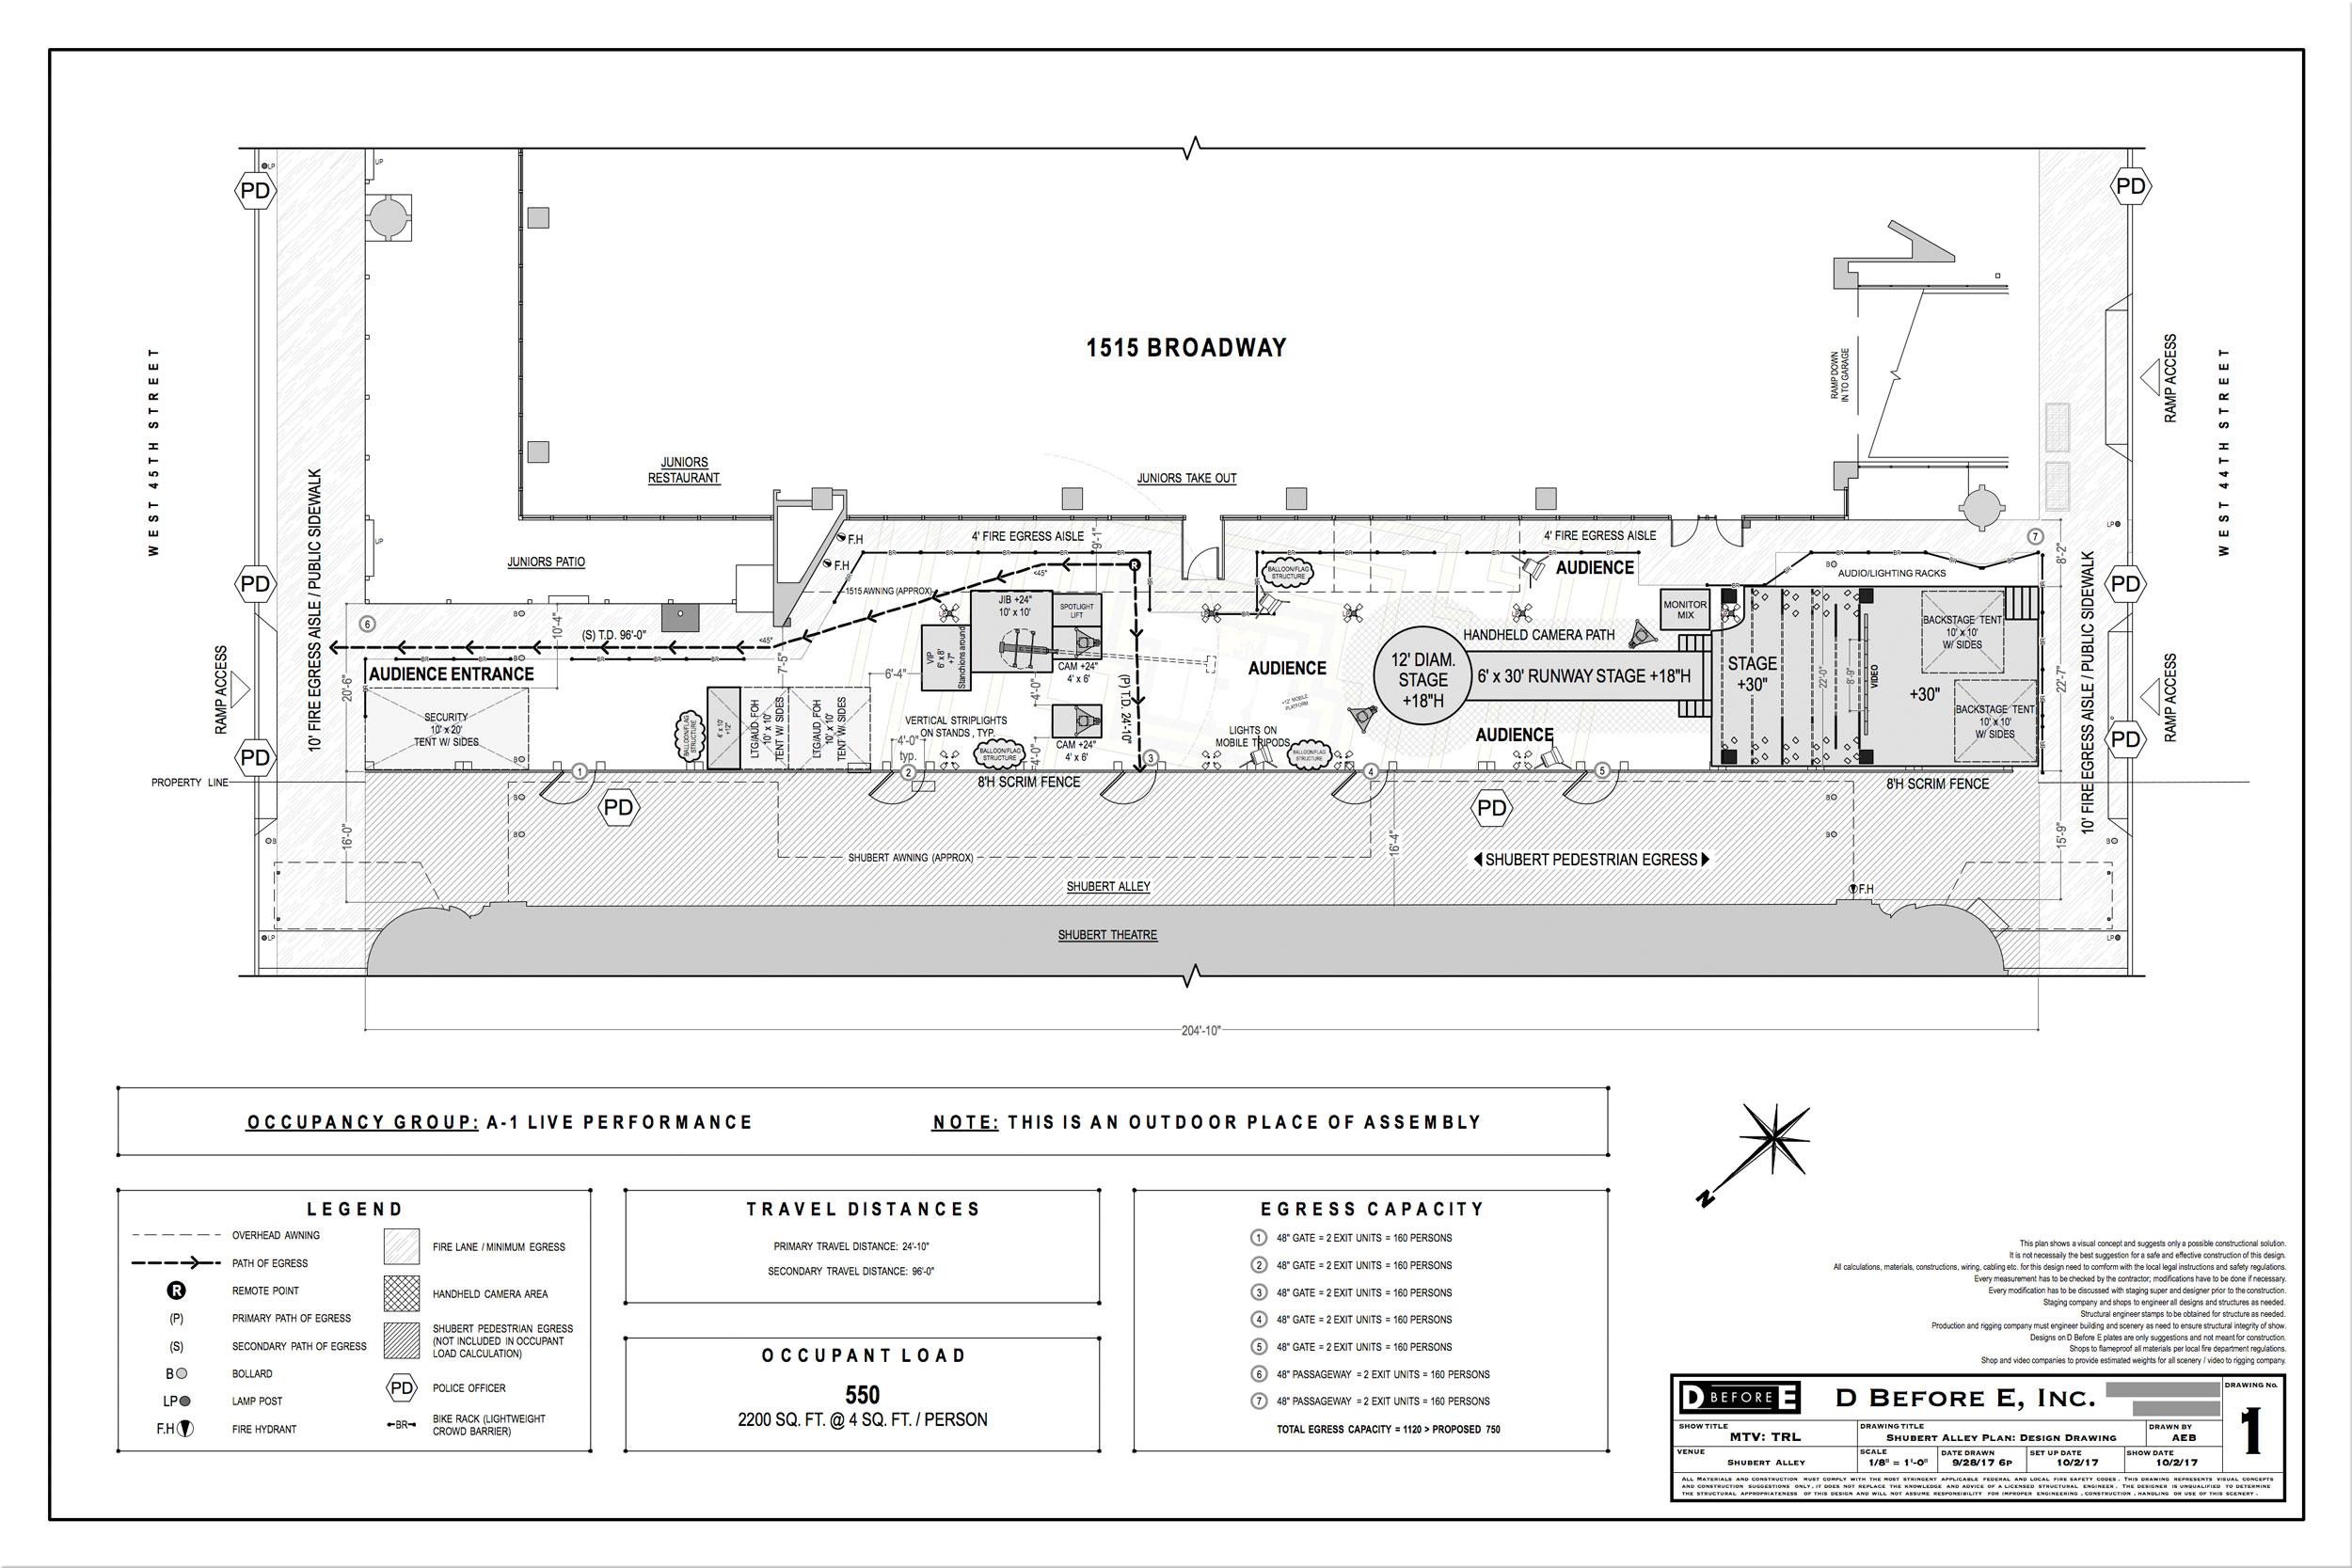 andy-broomell-trl-shubert-alley-concert-groundplan-vectorworks.jpg